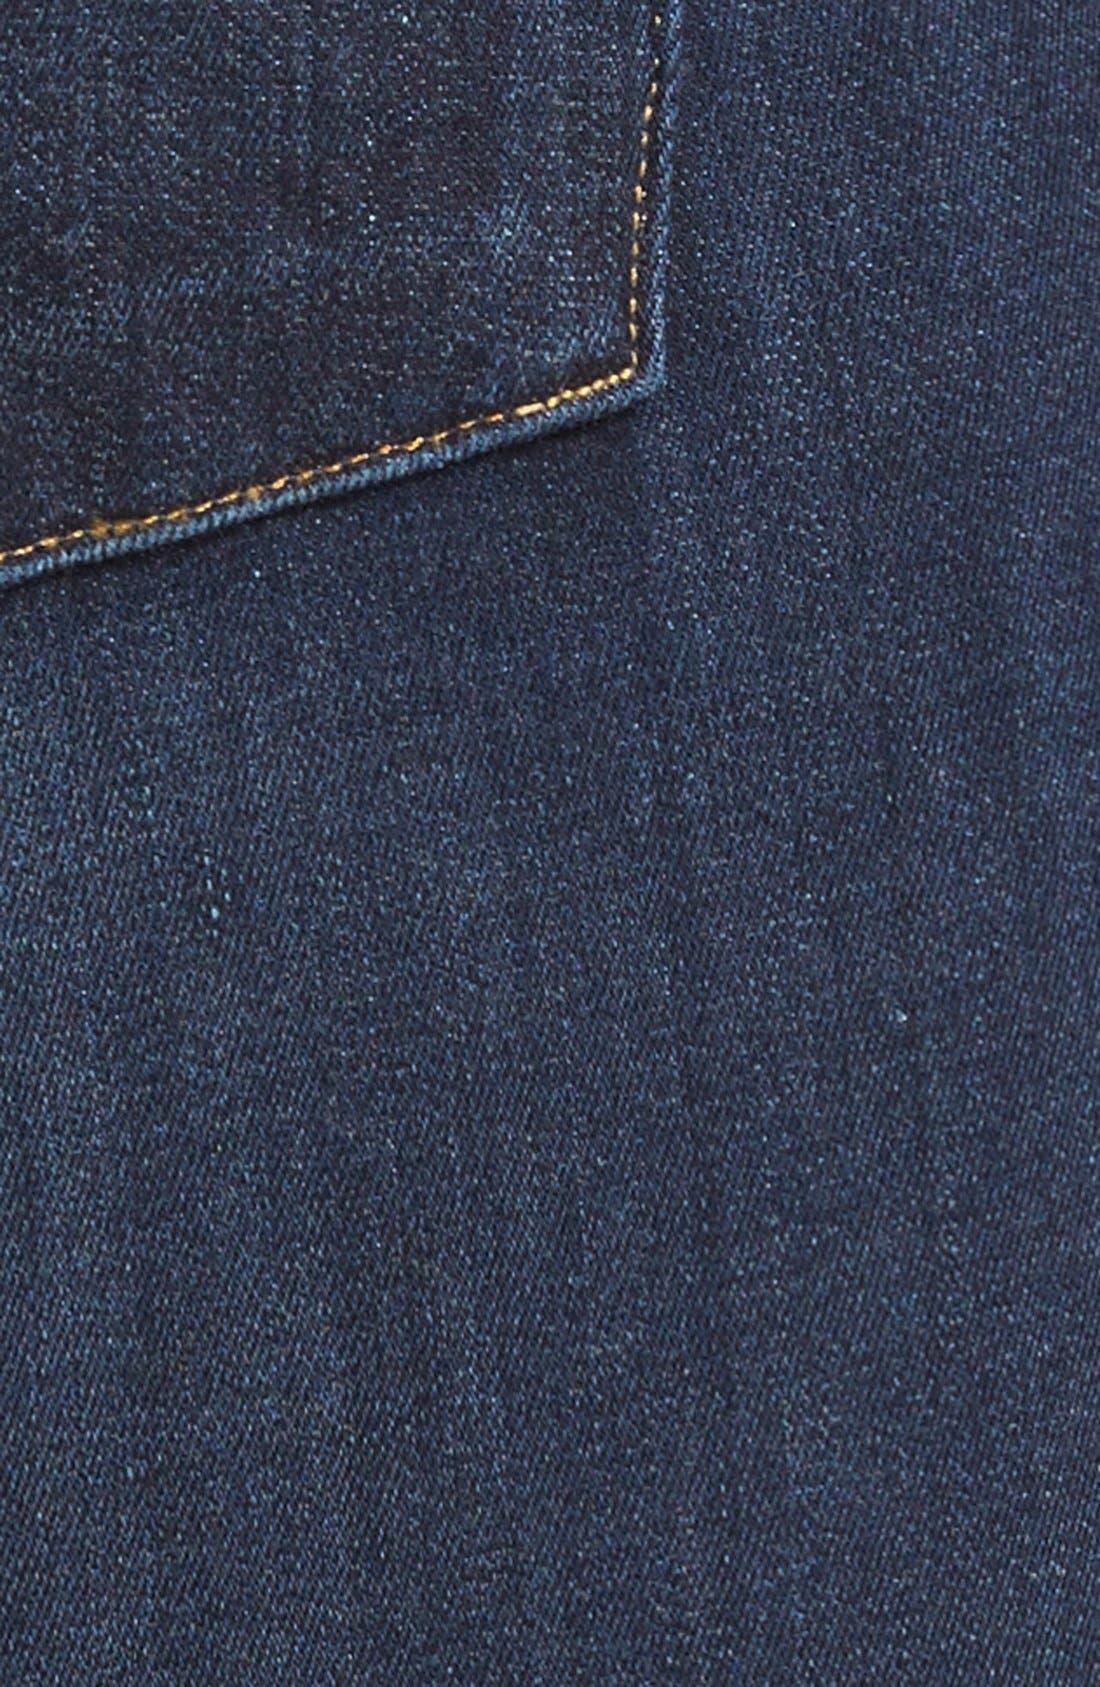 'Collin' Skinny Jeans,                             Alternate thumbnail 3, color,                             401